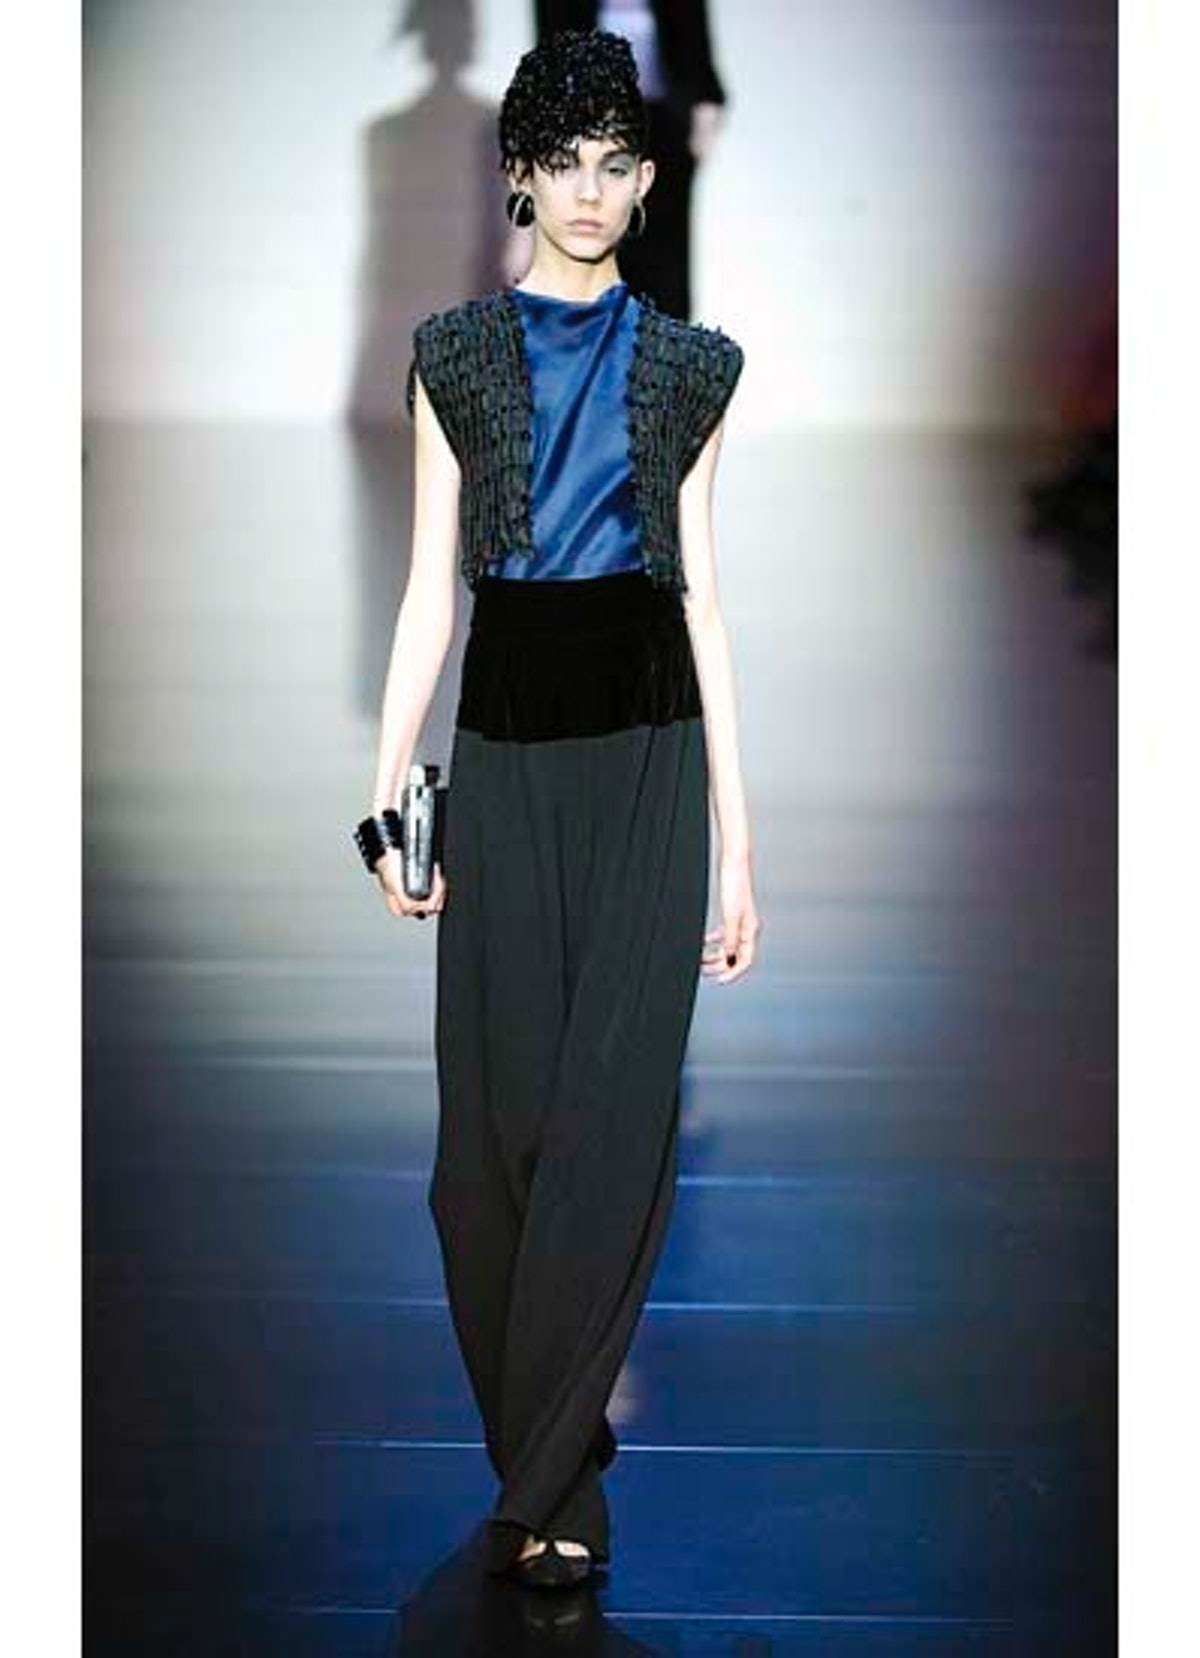 fass-giorgio-armani-couture-2012-runway-29-v.jpg